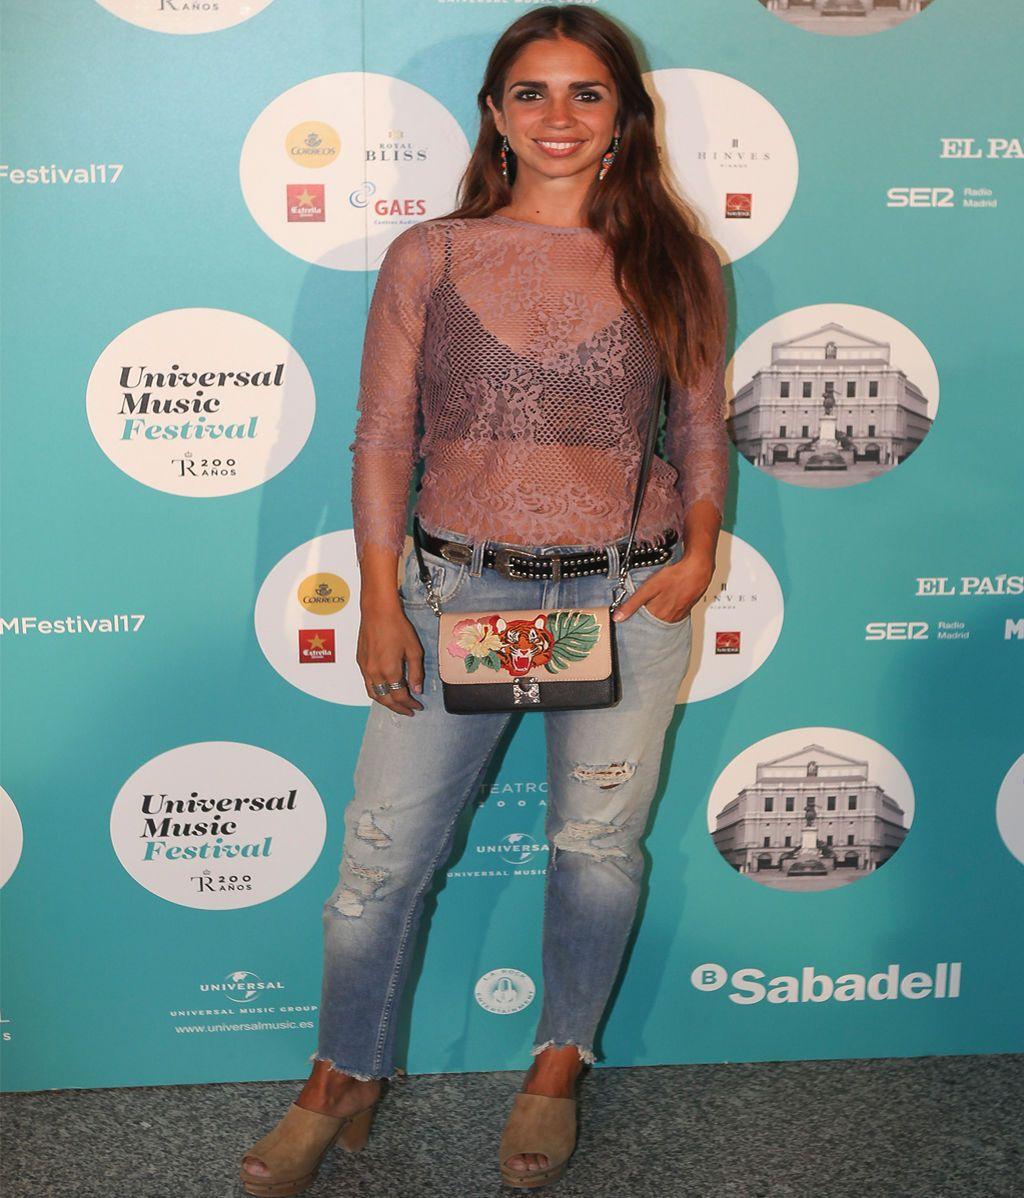 La actriz Elena Furiase tampoco faltó a la cita